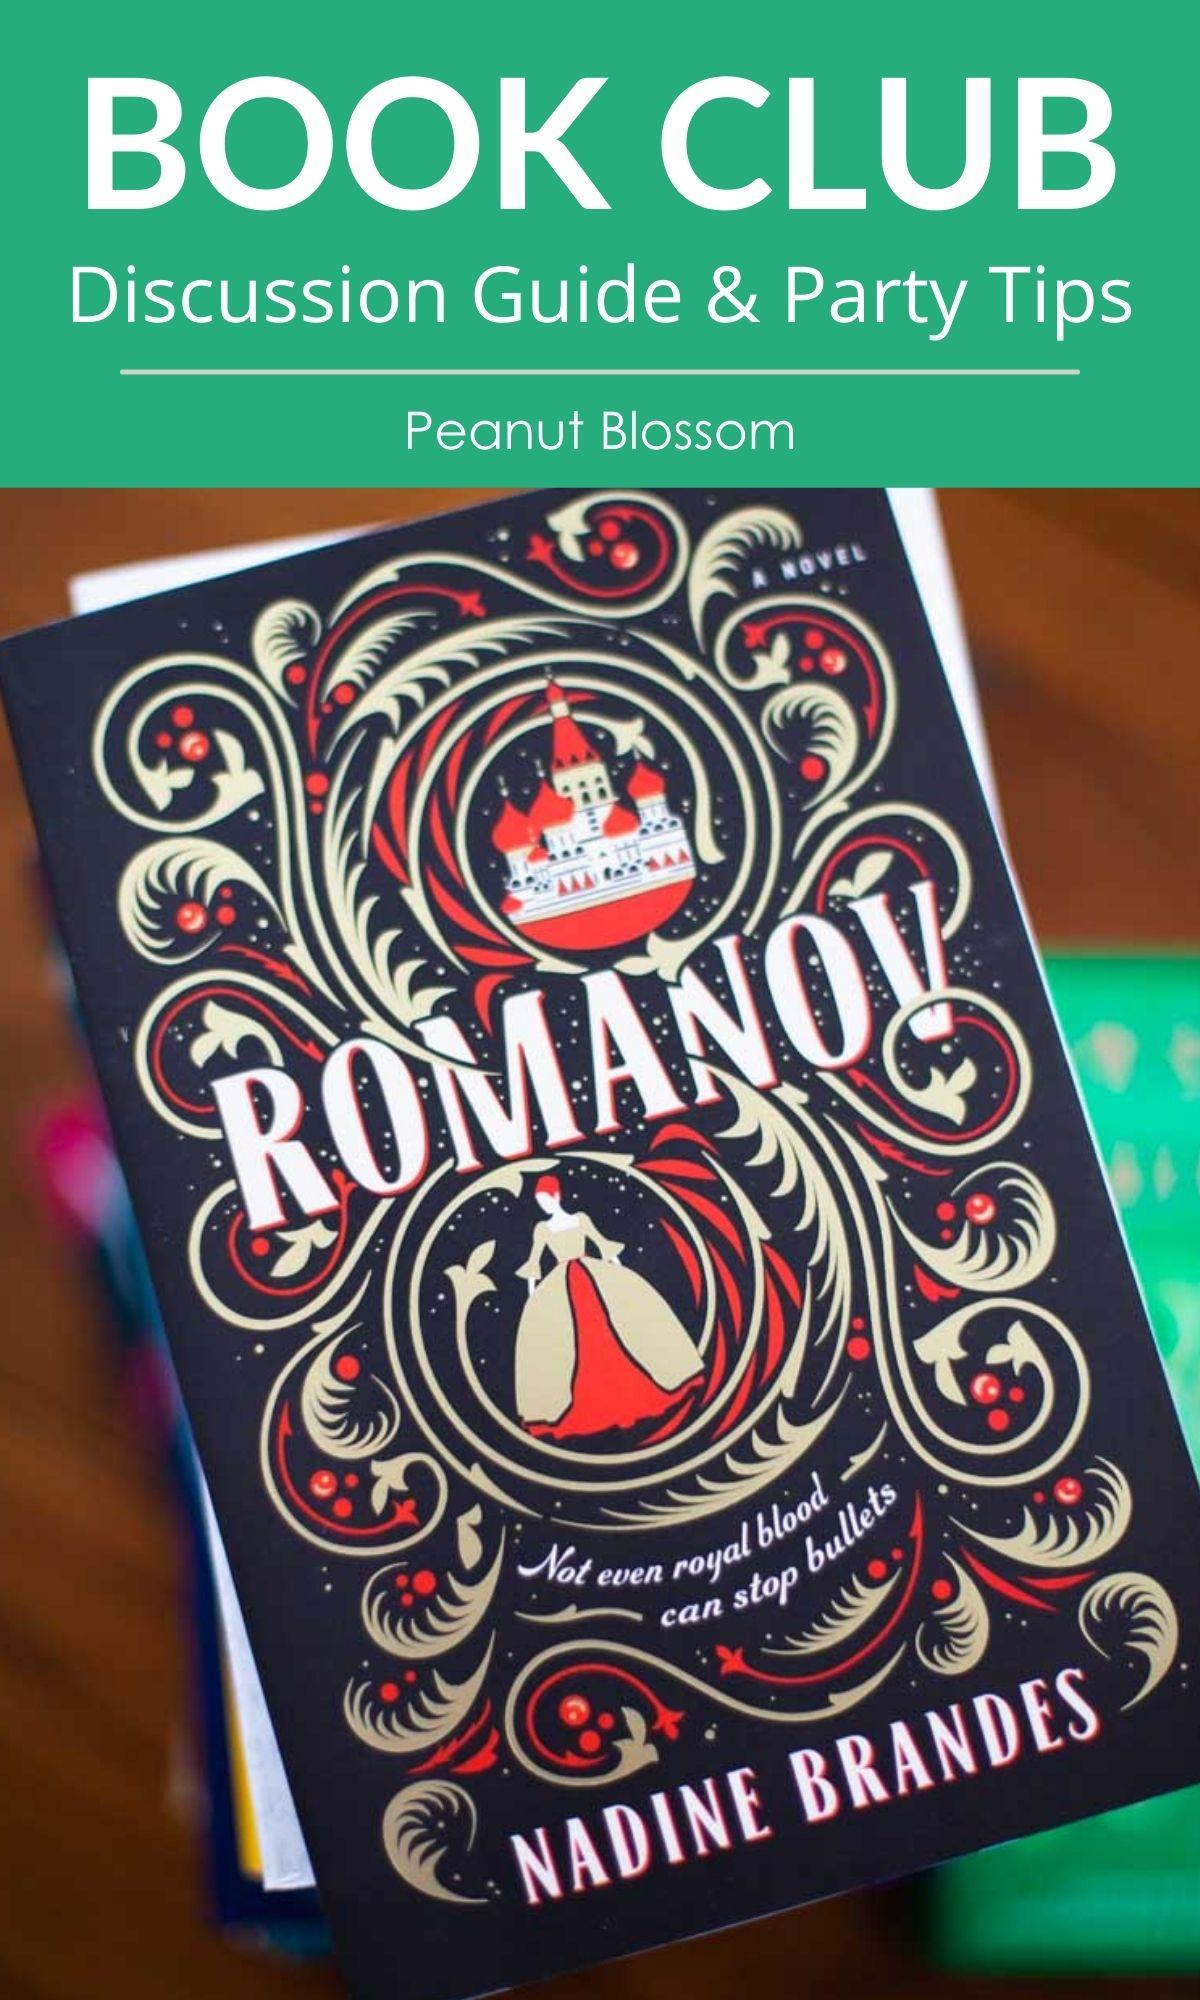 The cover of the book Romanov